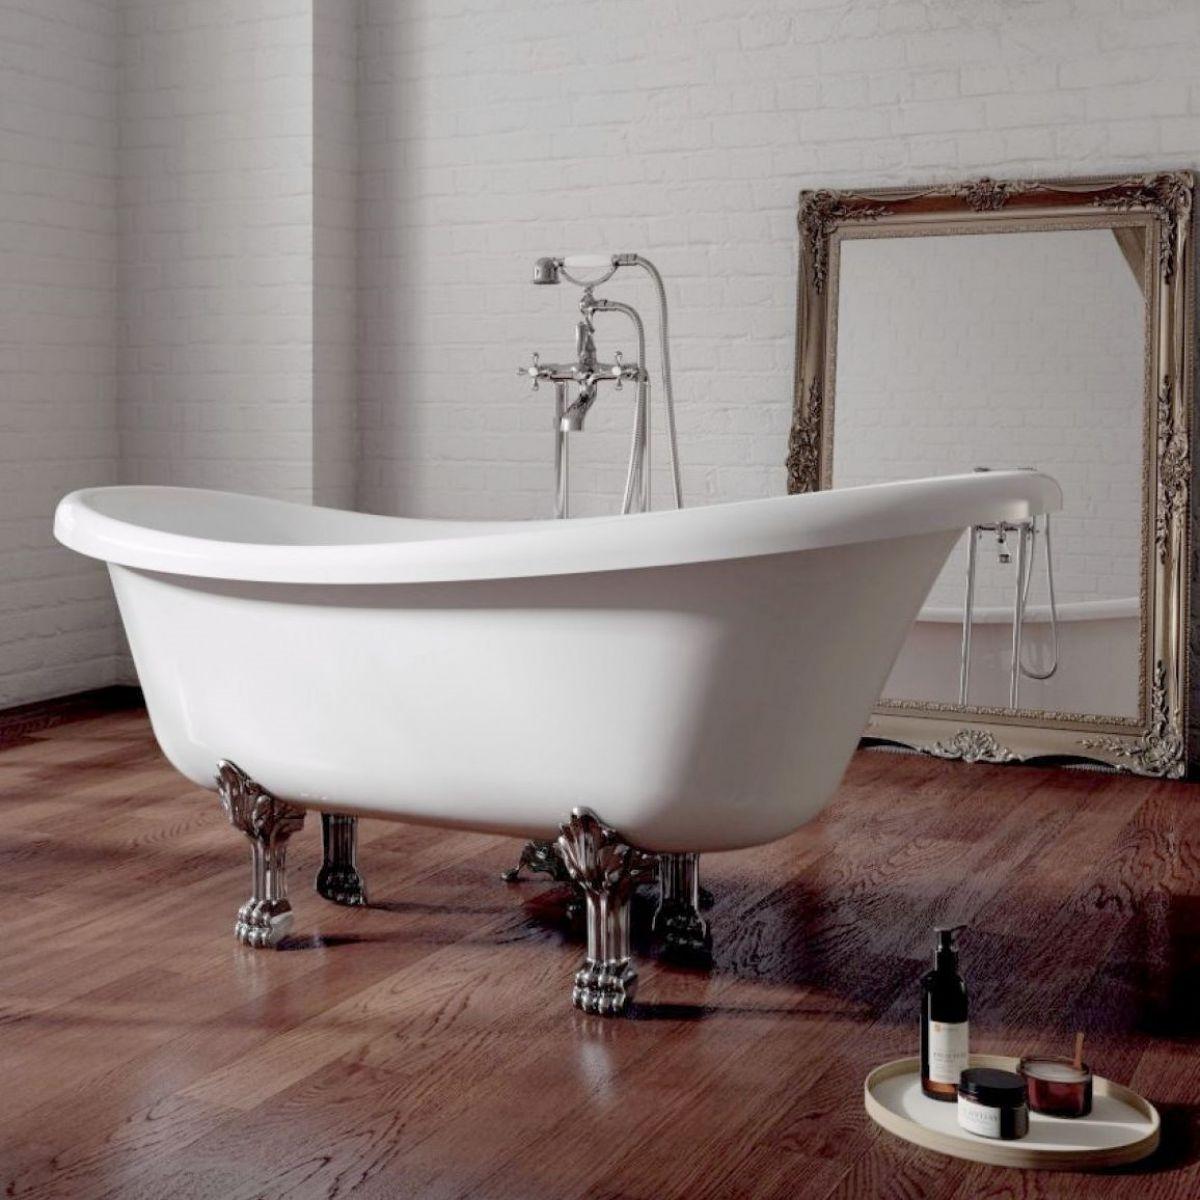 Ramsden & Mosley Skye Roll Top Bath : UK Bathrooms